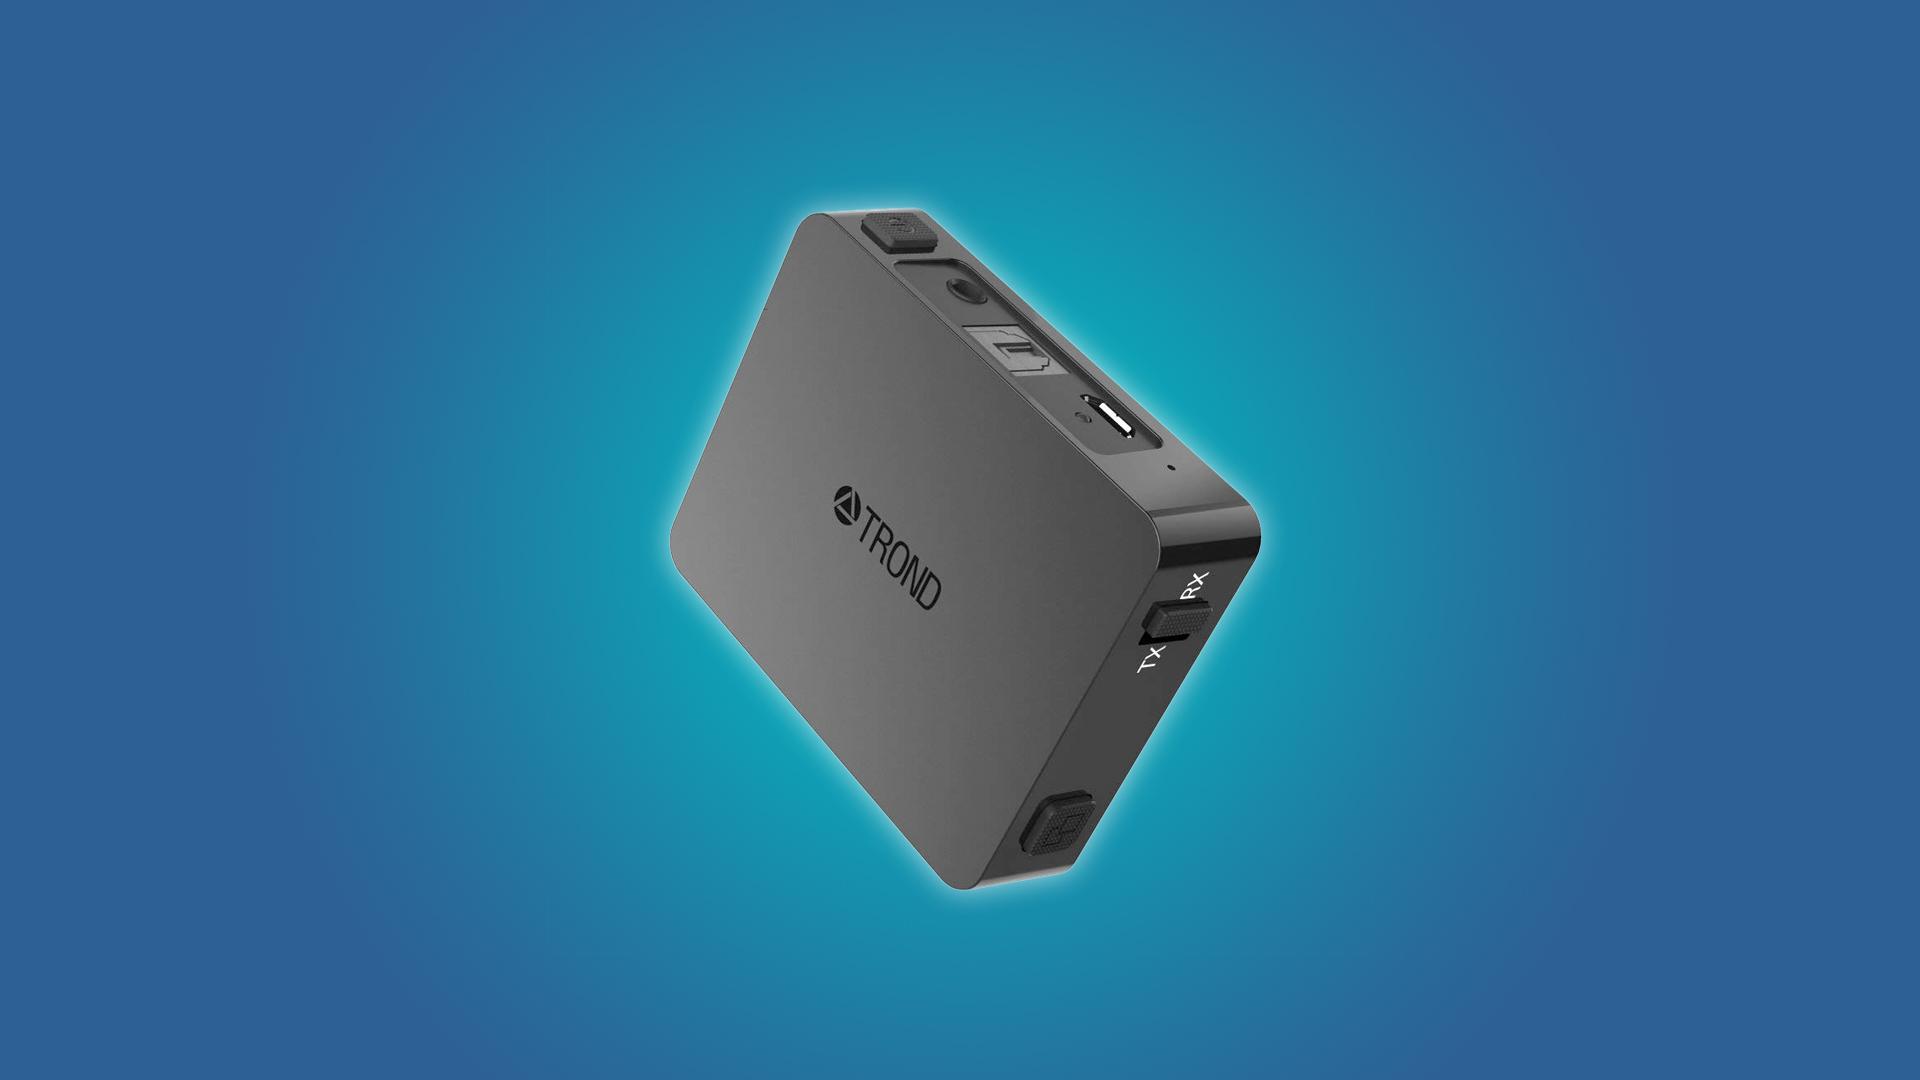 Trond Bluetooth adapter